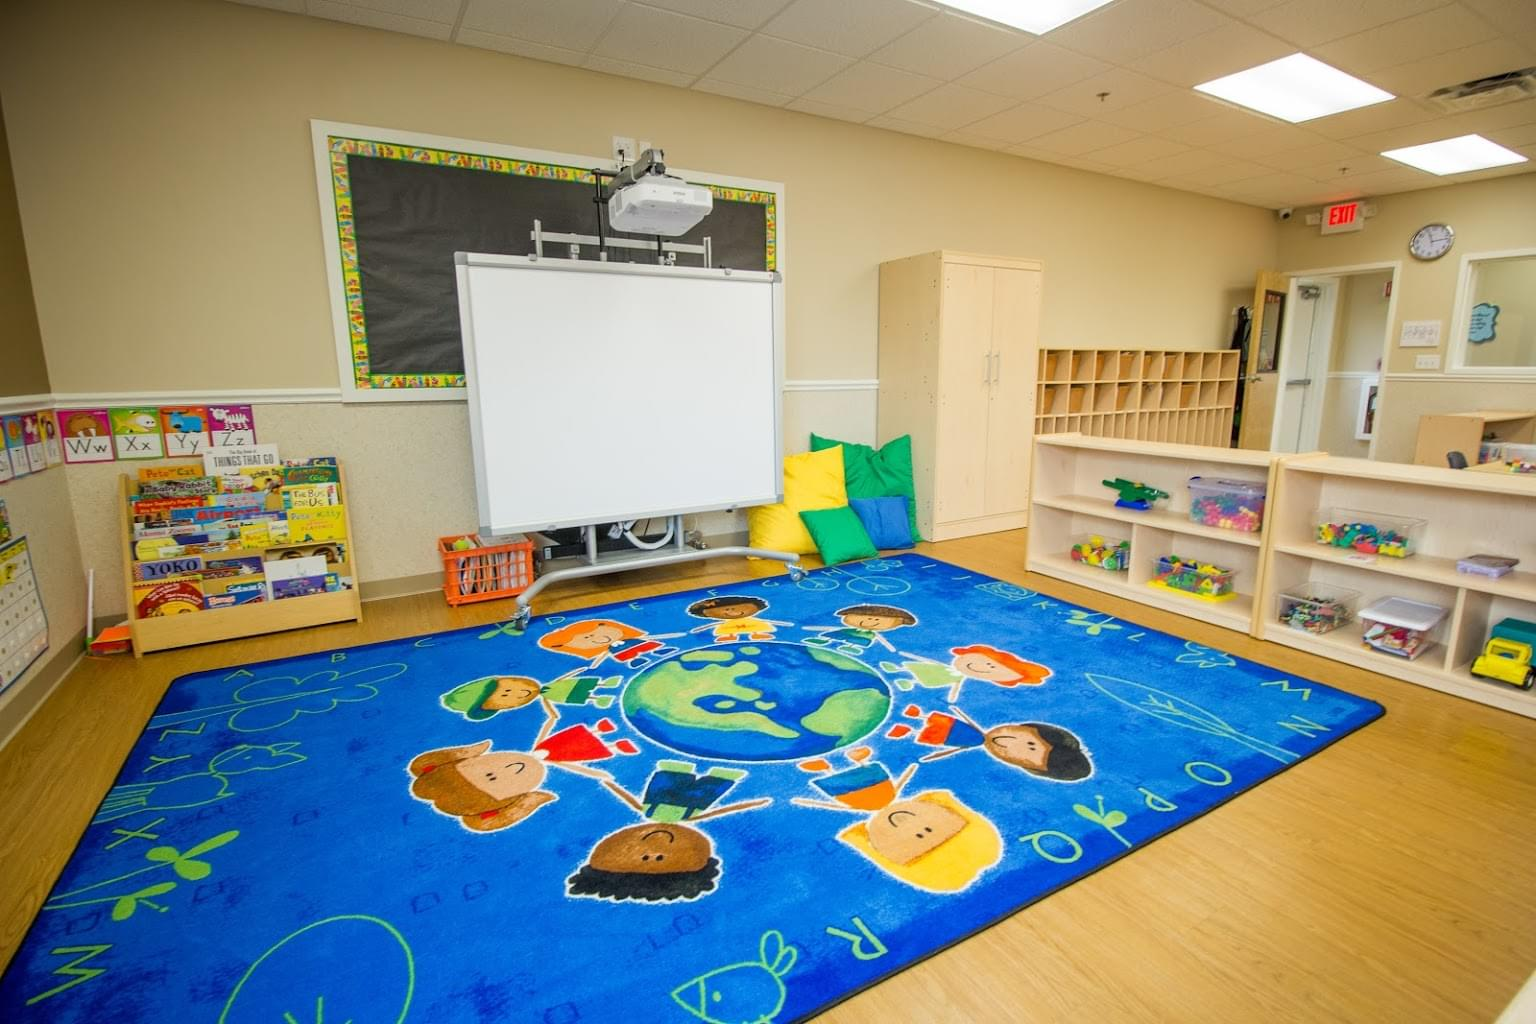 Lightbridge Academy pre-school in Bethlehem, PA rug in classroom projector